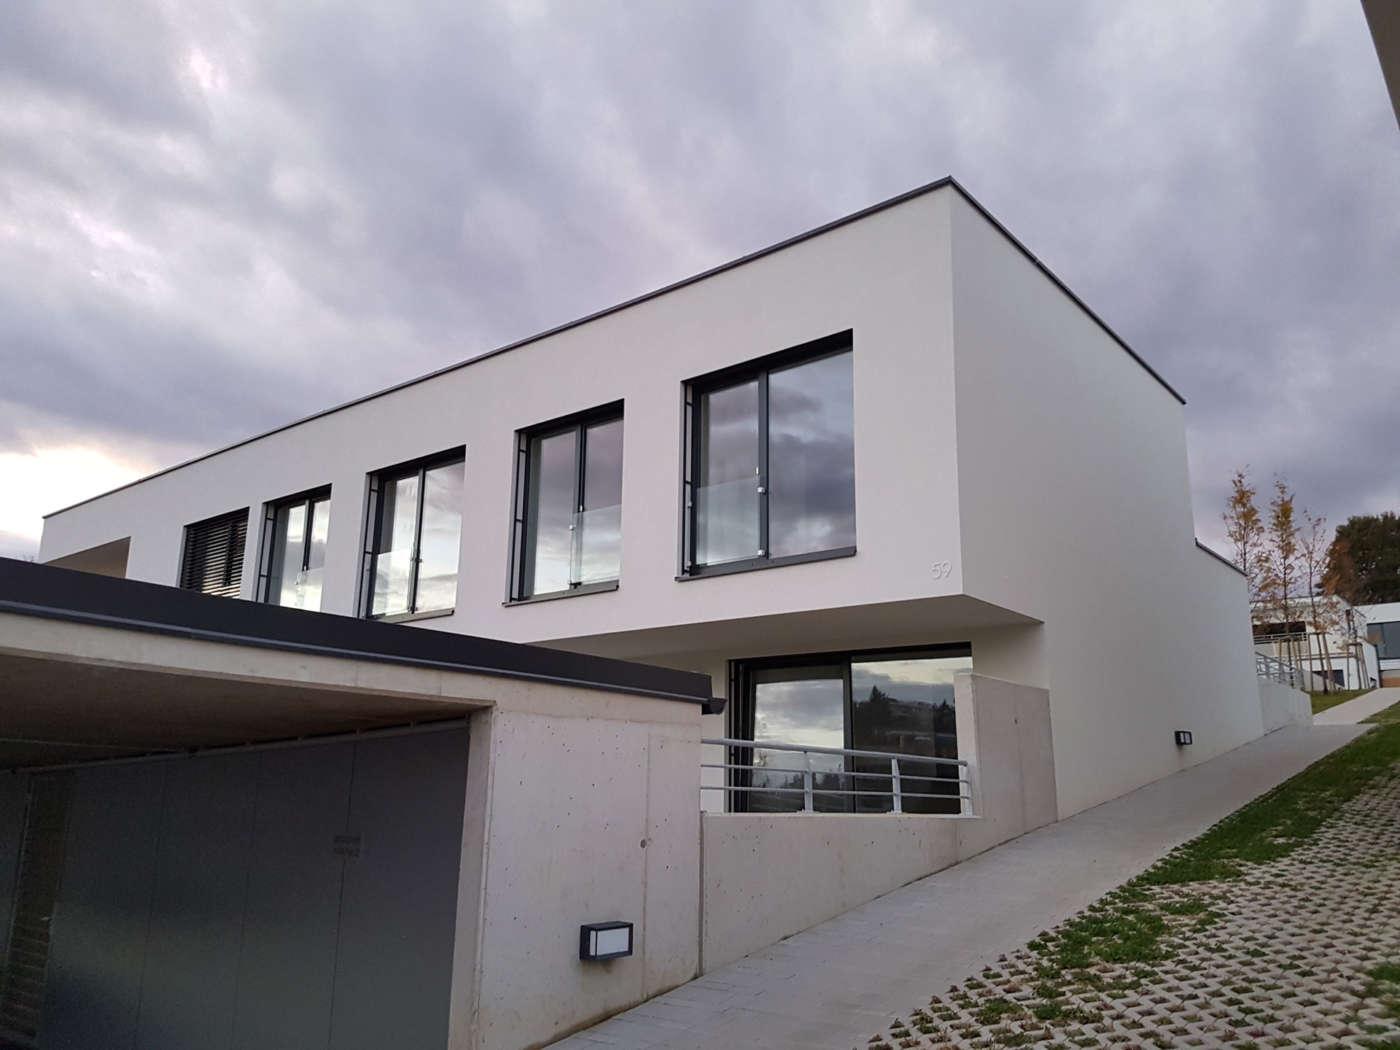 Wohnbau Waltendorf in 8010 Graz